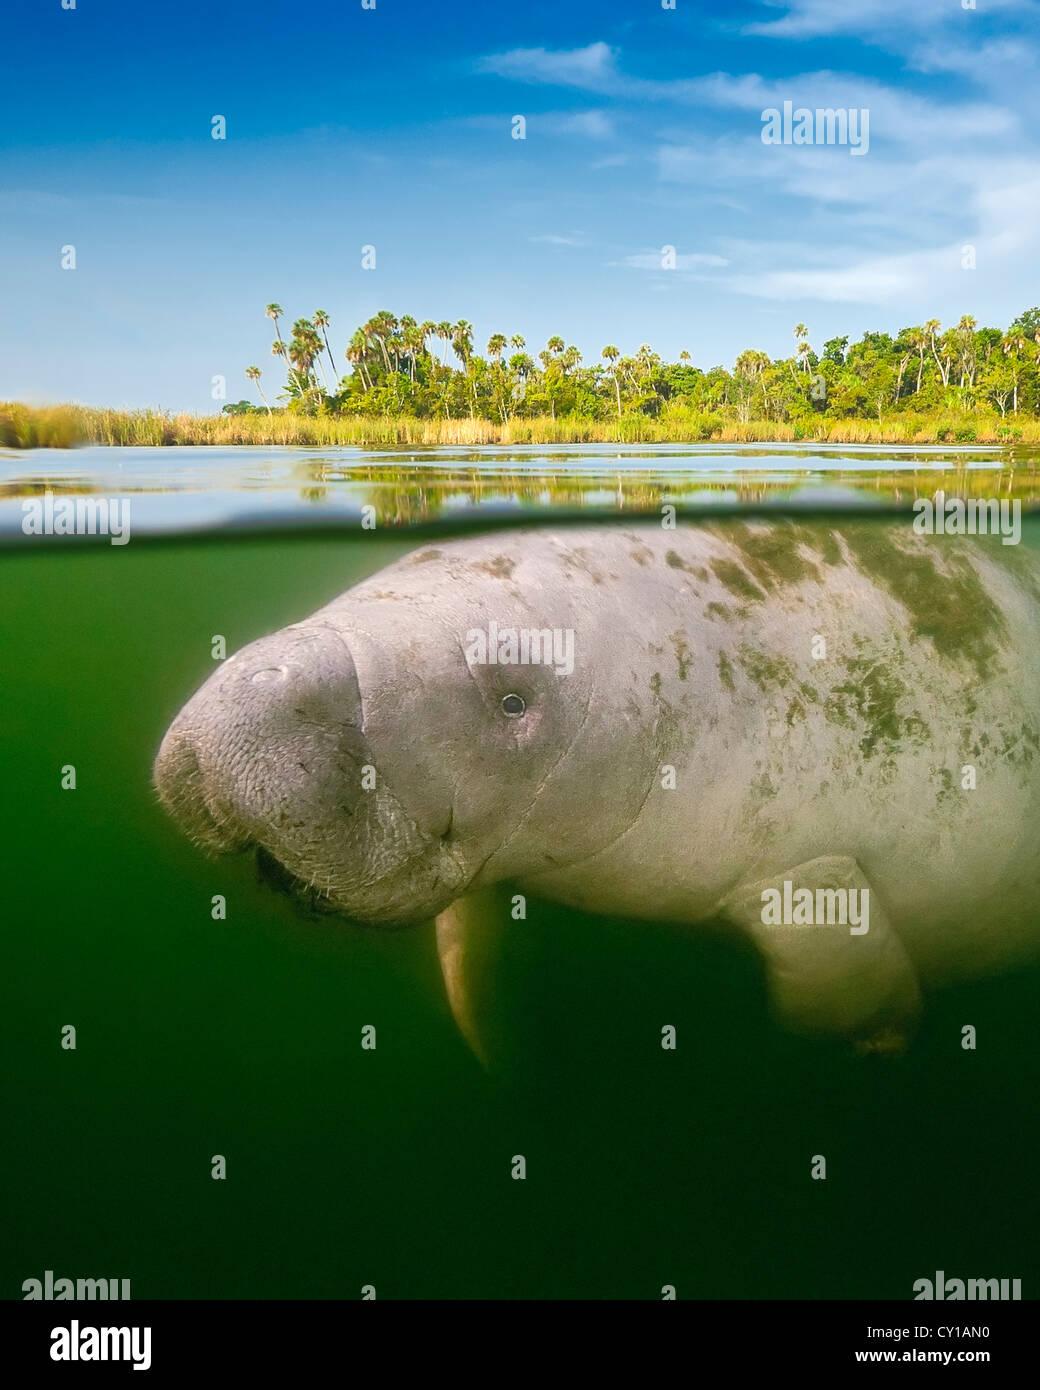 Florida Manatee, Trichechus manatus latirostris, Crystal River, Florida, Stati Uniti d'America Immagini Stock